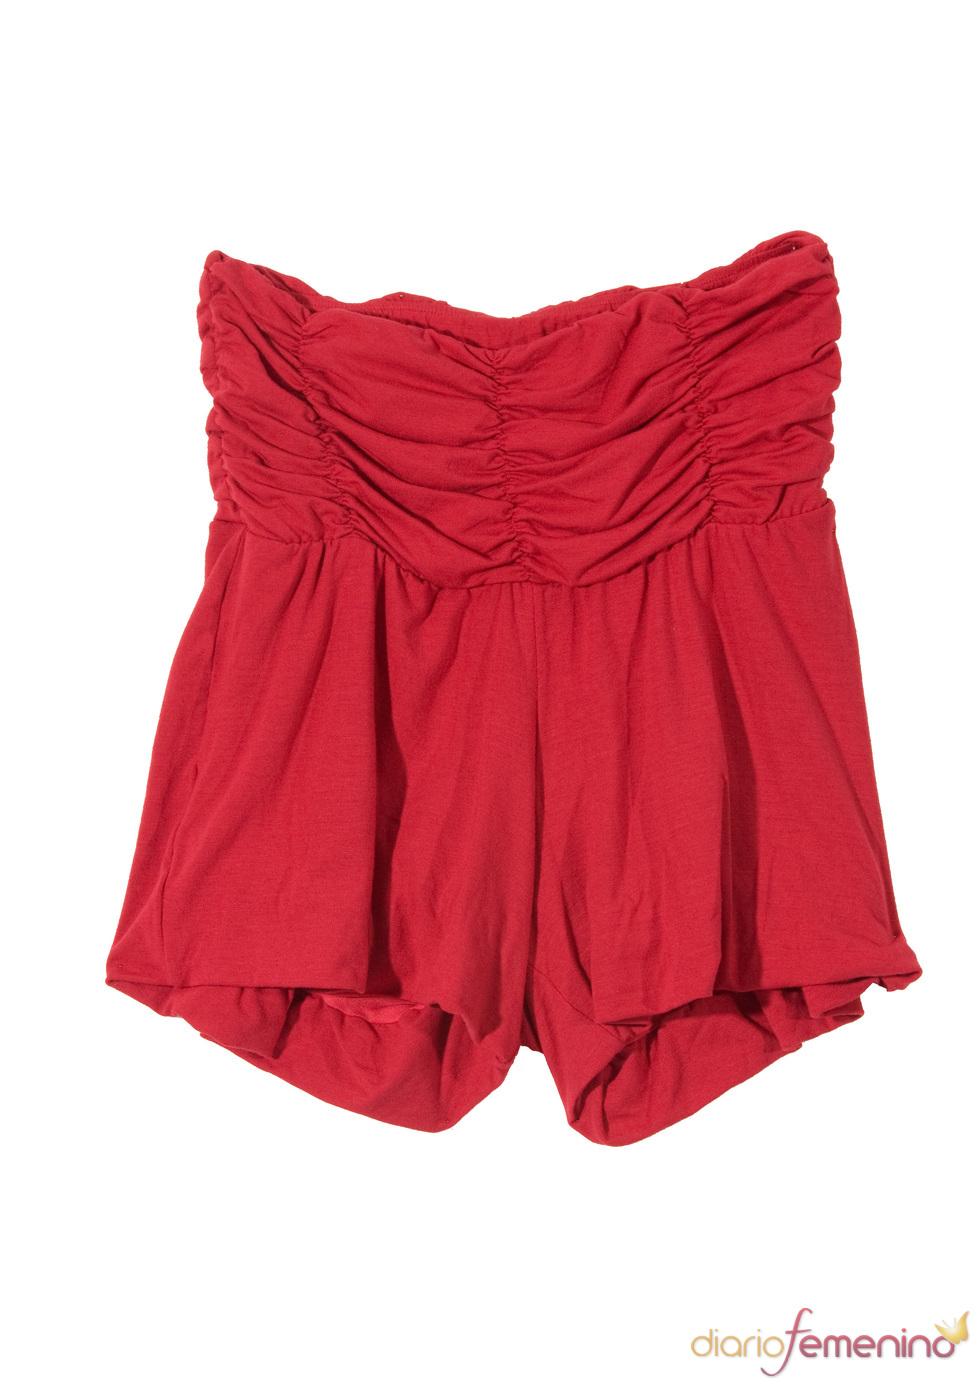 Idea para San Valentín, pantalón rojo pasión  de 'Belook'